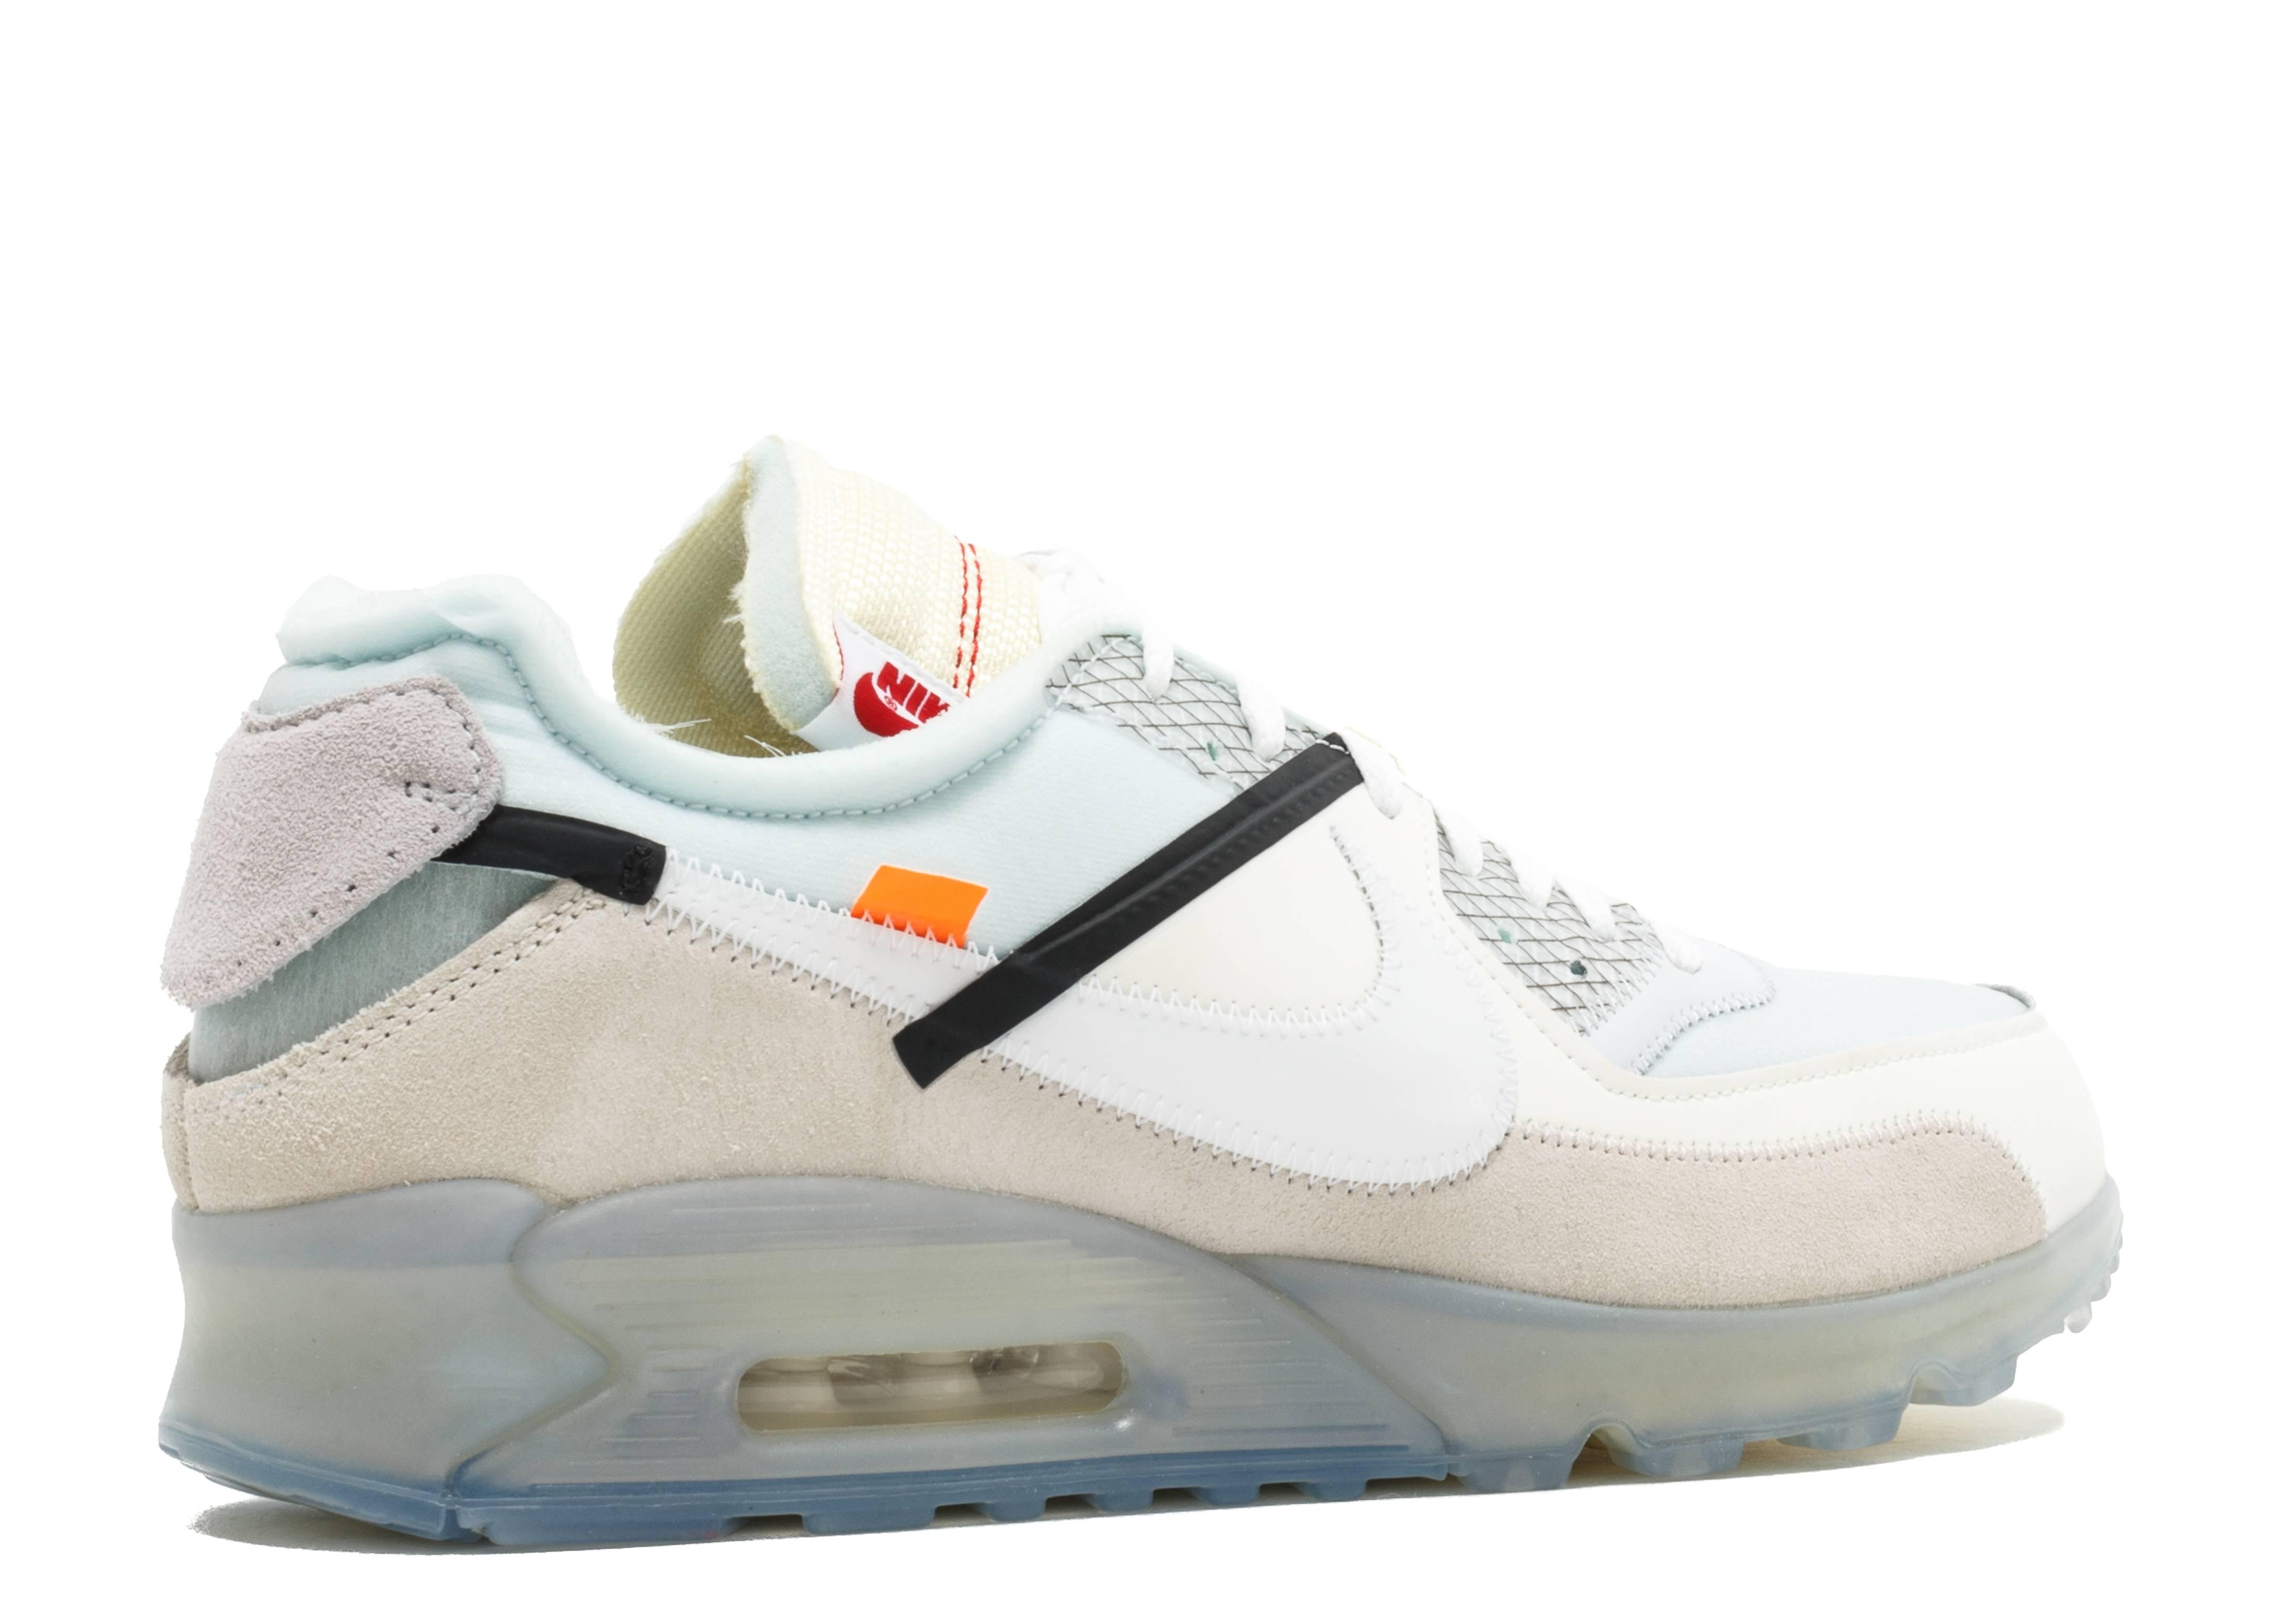 off white scarpe air max